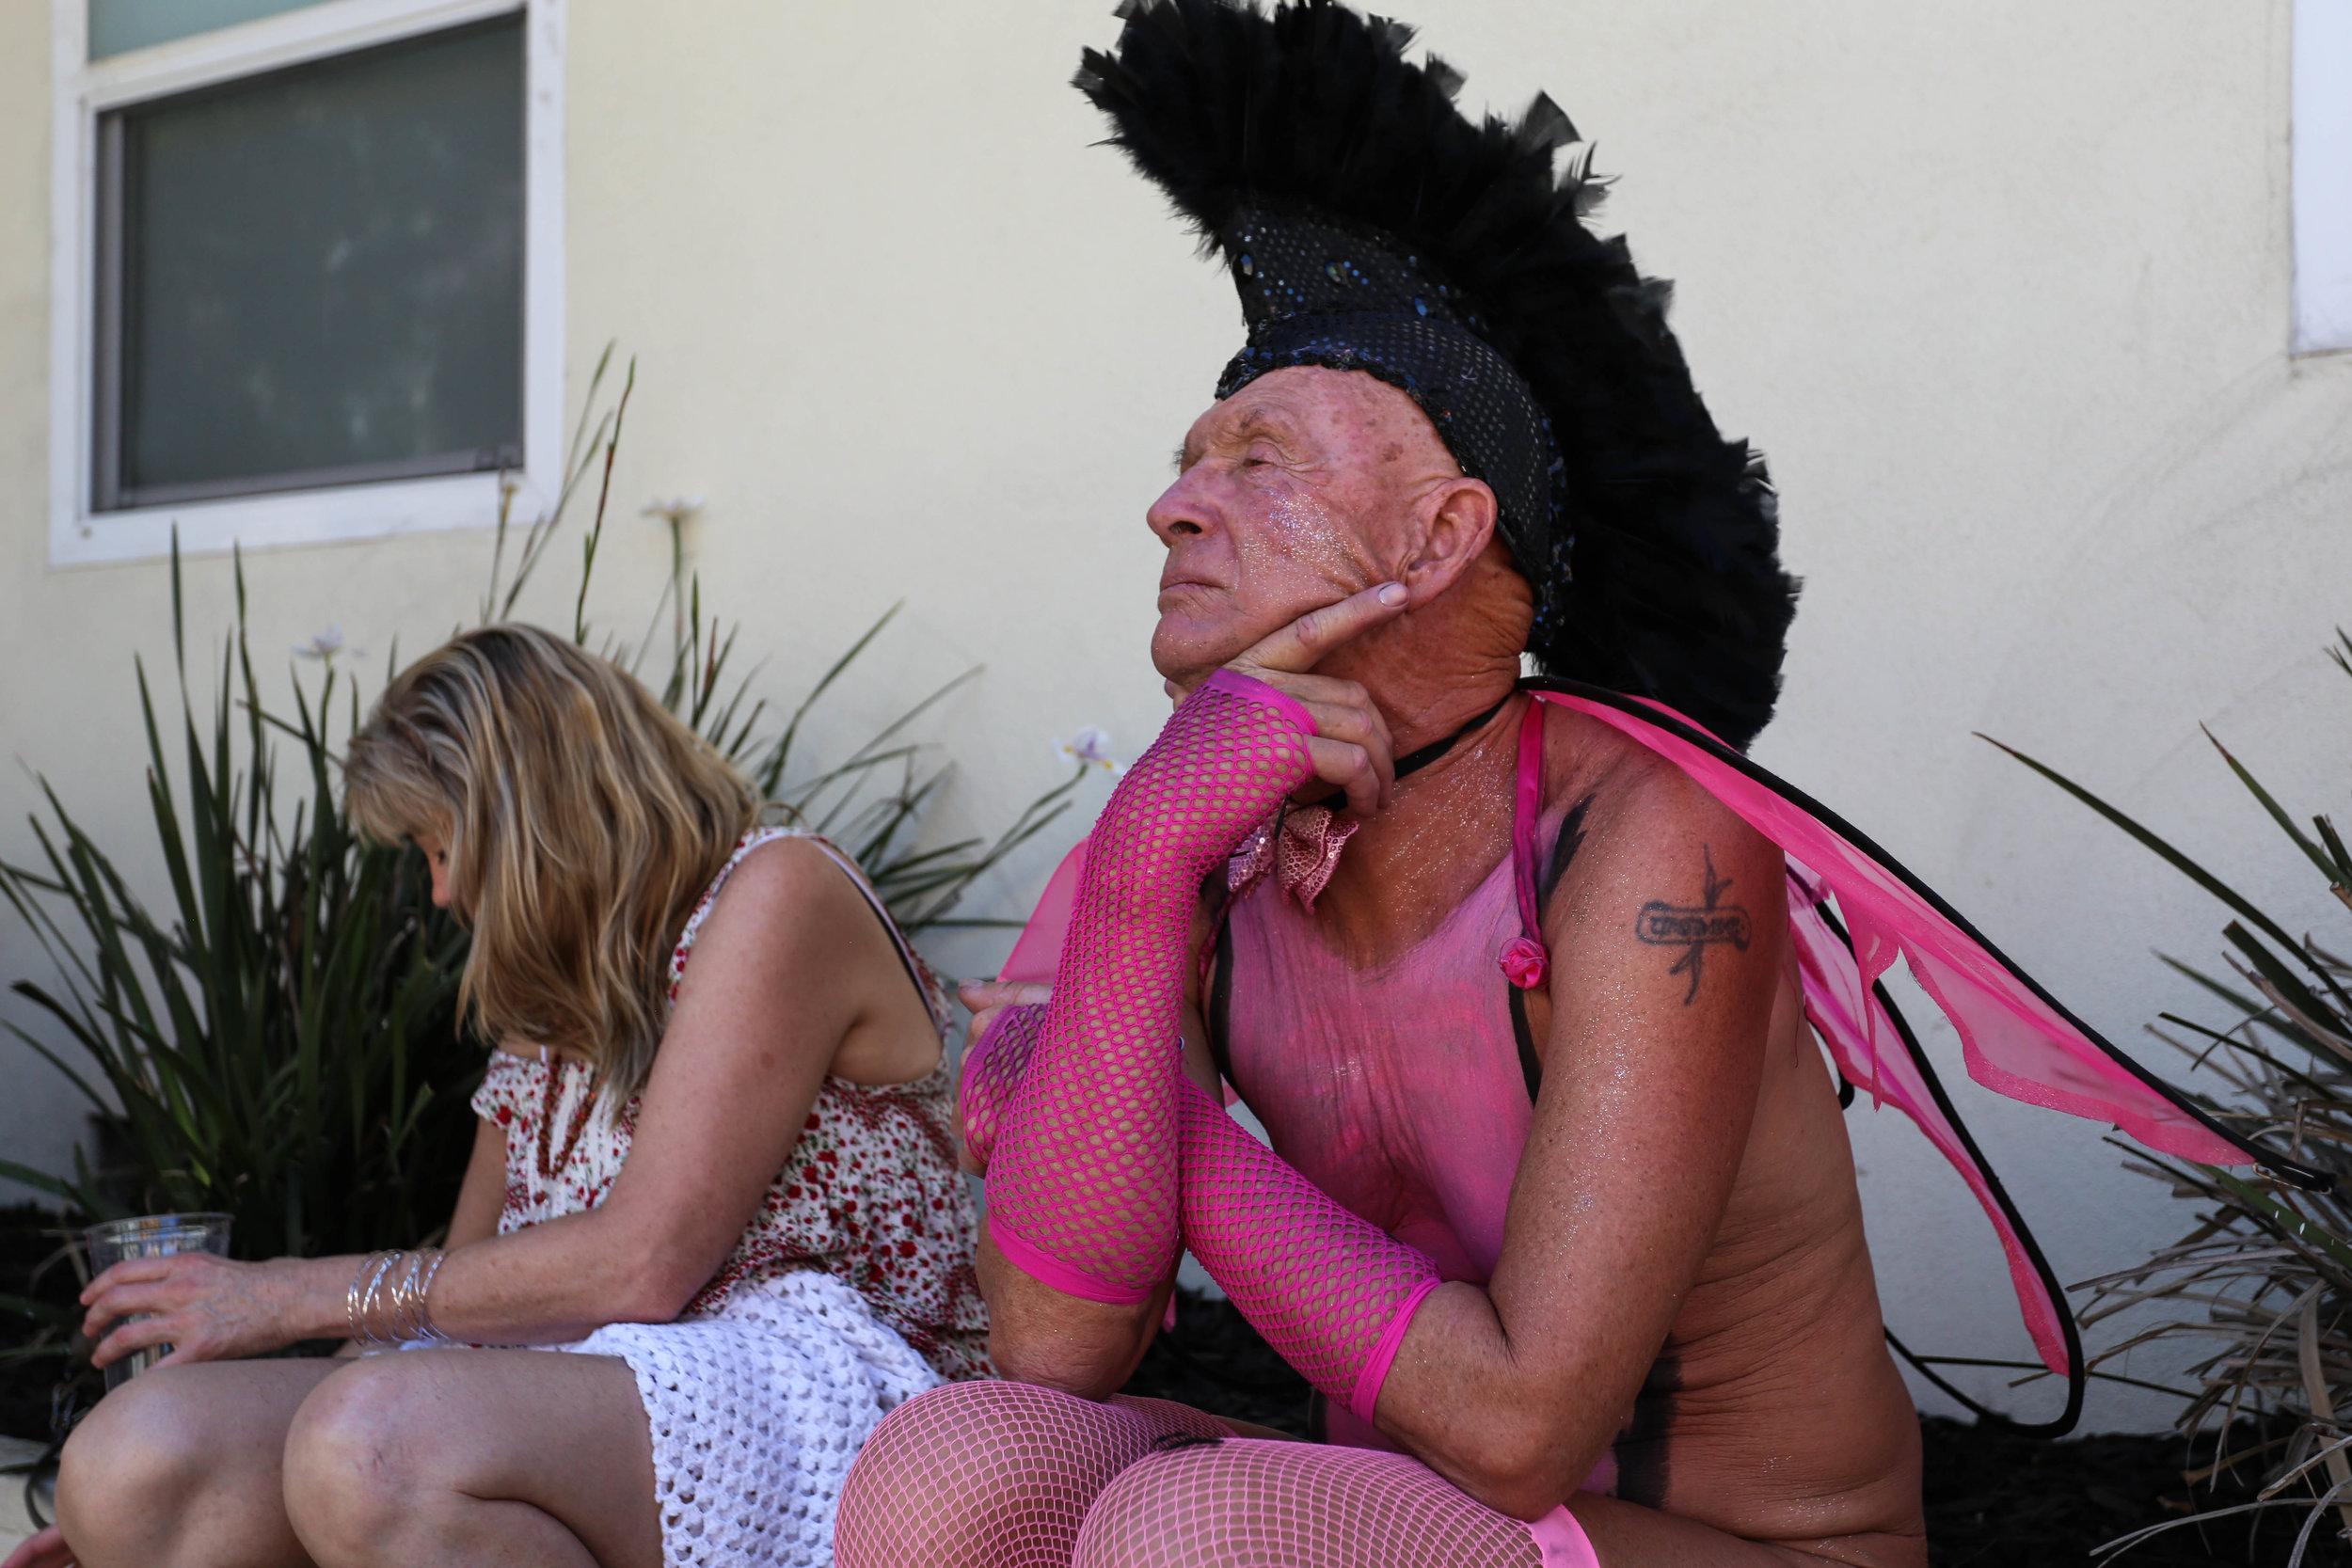 Max Schwab enjoying the shade at the Folsom Street Fair where hundreds gathered for the festivities, San Francisco, California, Sunday, Sept. 25, 2016. (Jessica Webb)